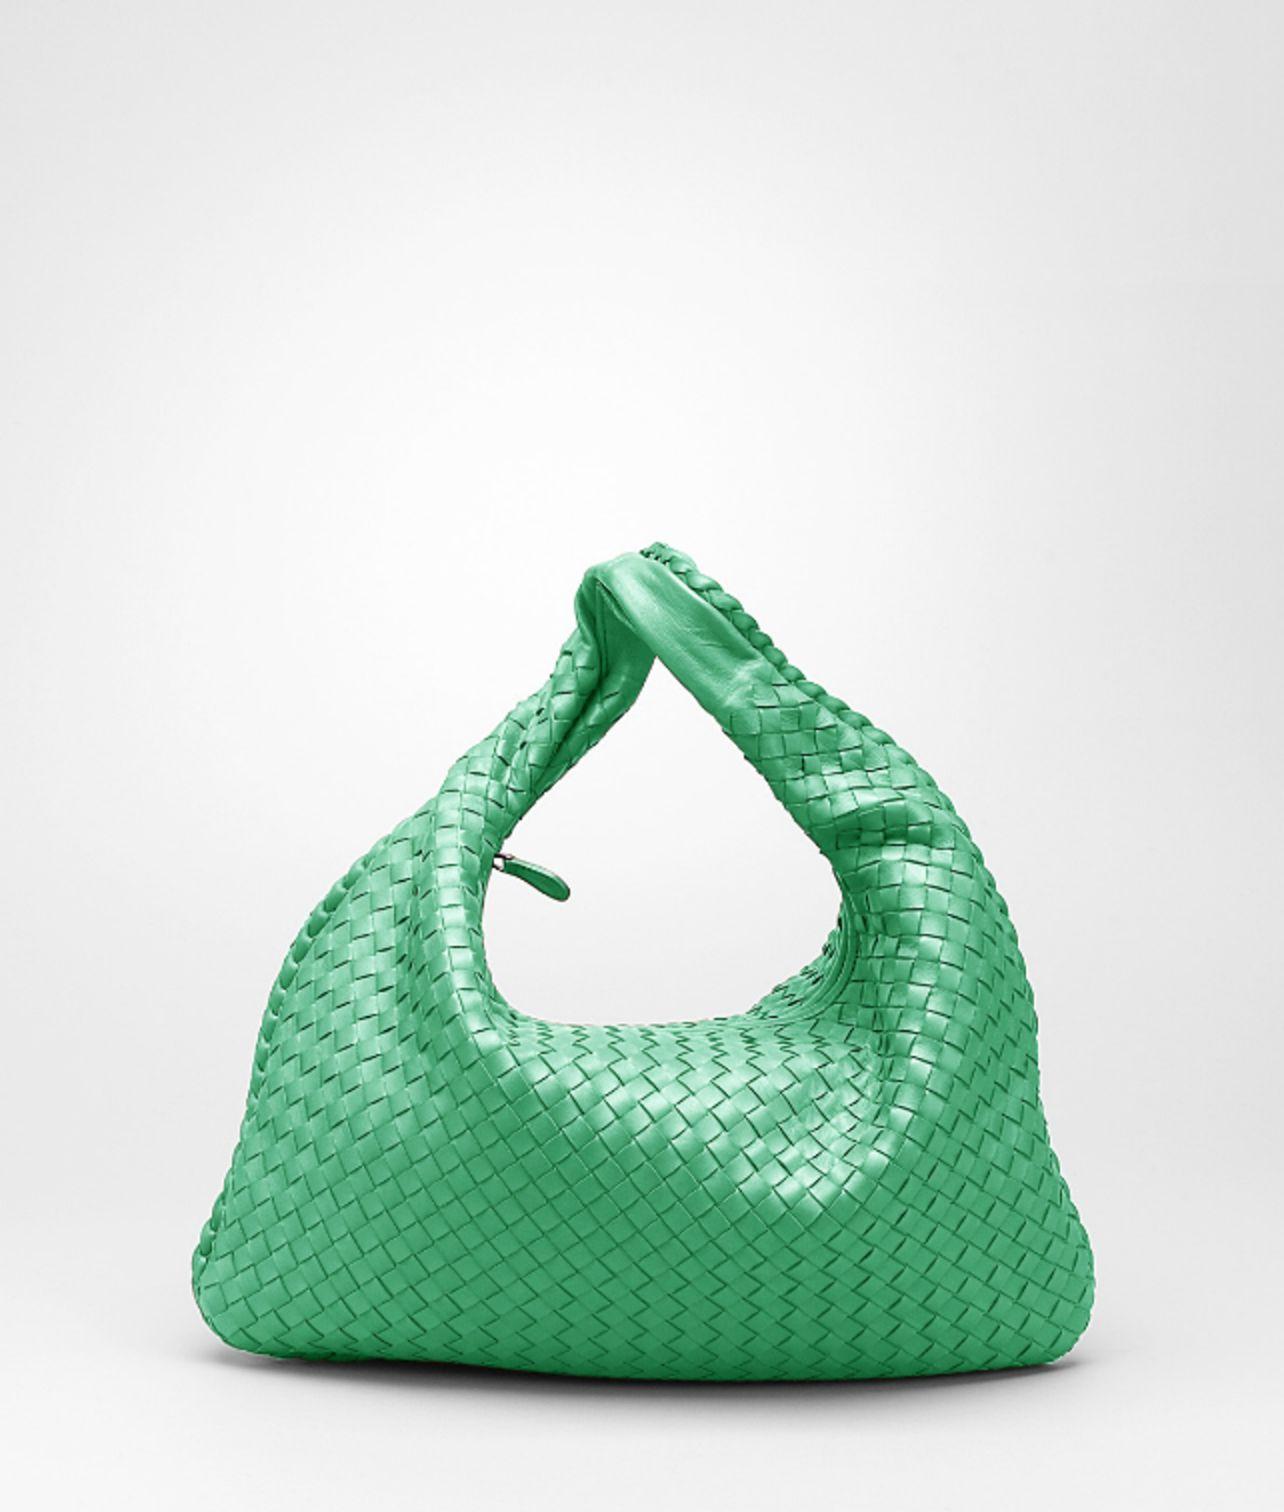 Lyst - Bottega Veneta Trèfle Intrecciato Nappa Veneta in Green 5fee2db6d3c8d